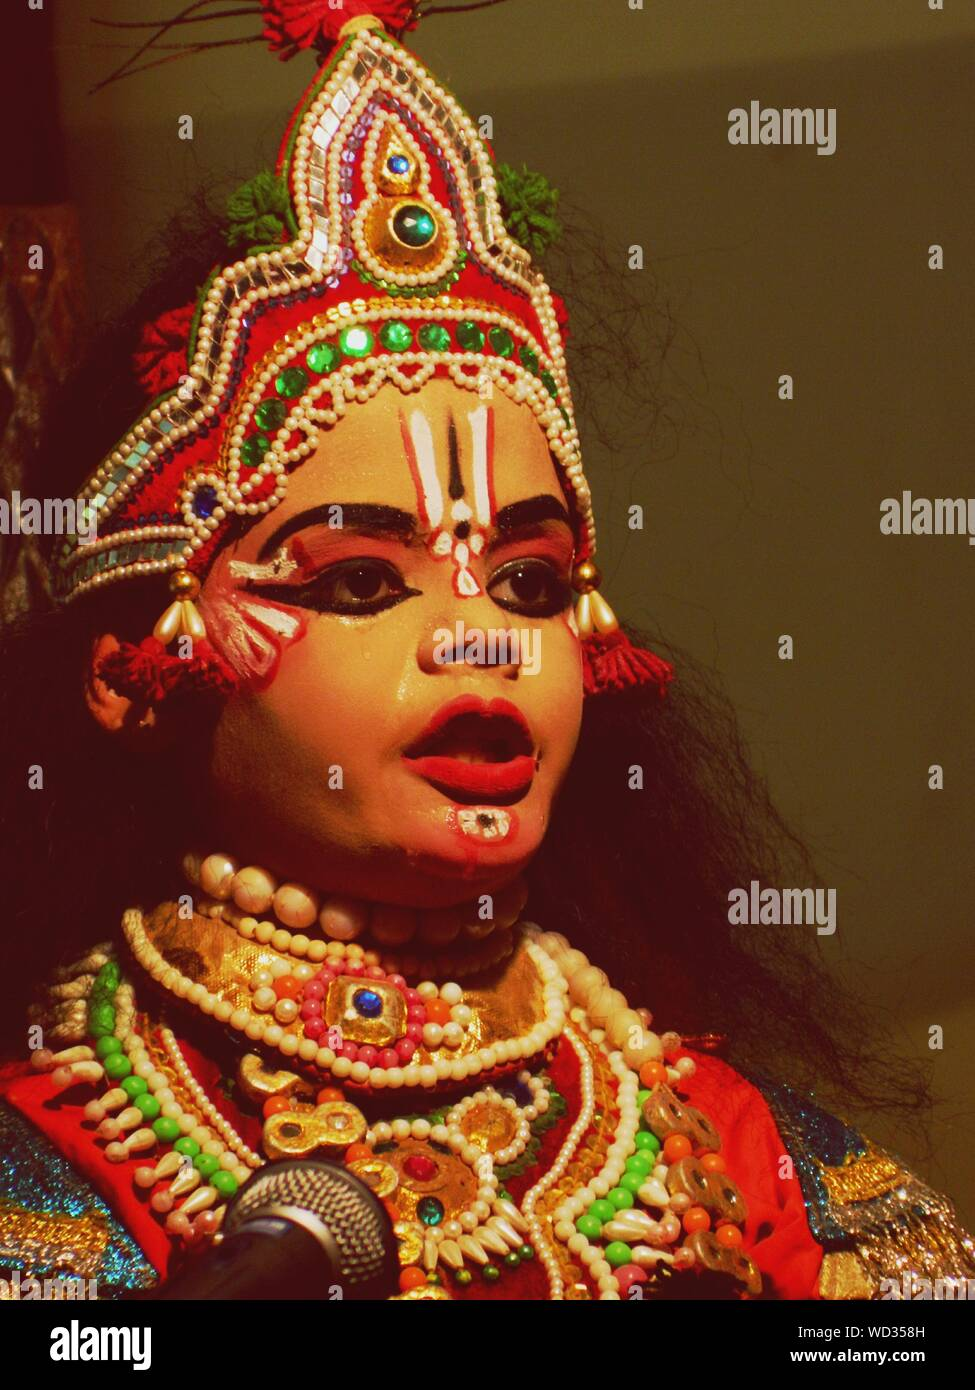 boy in krishna costume while performing yakshagana WD358H